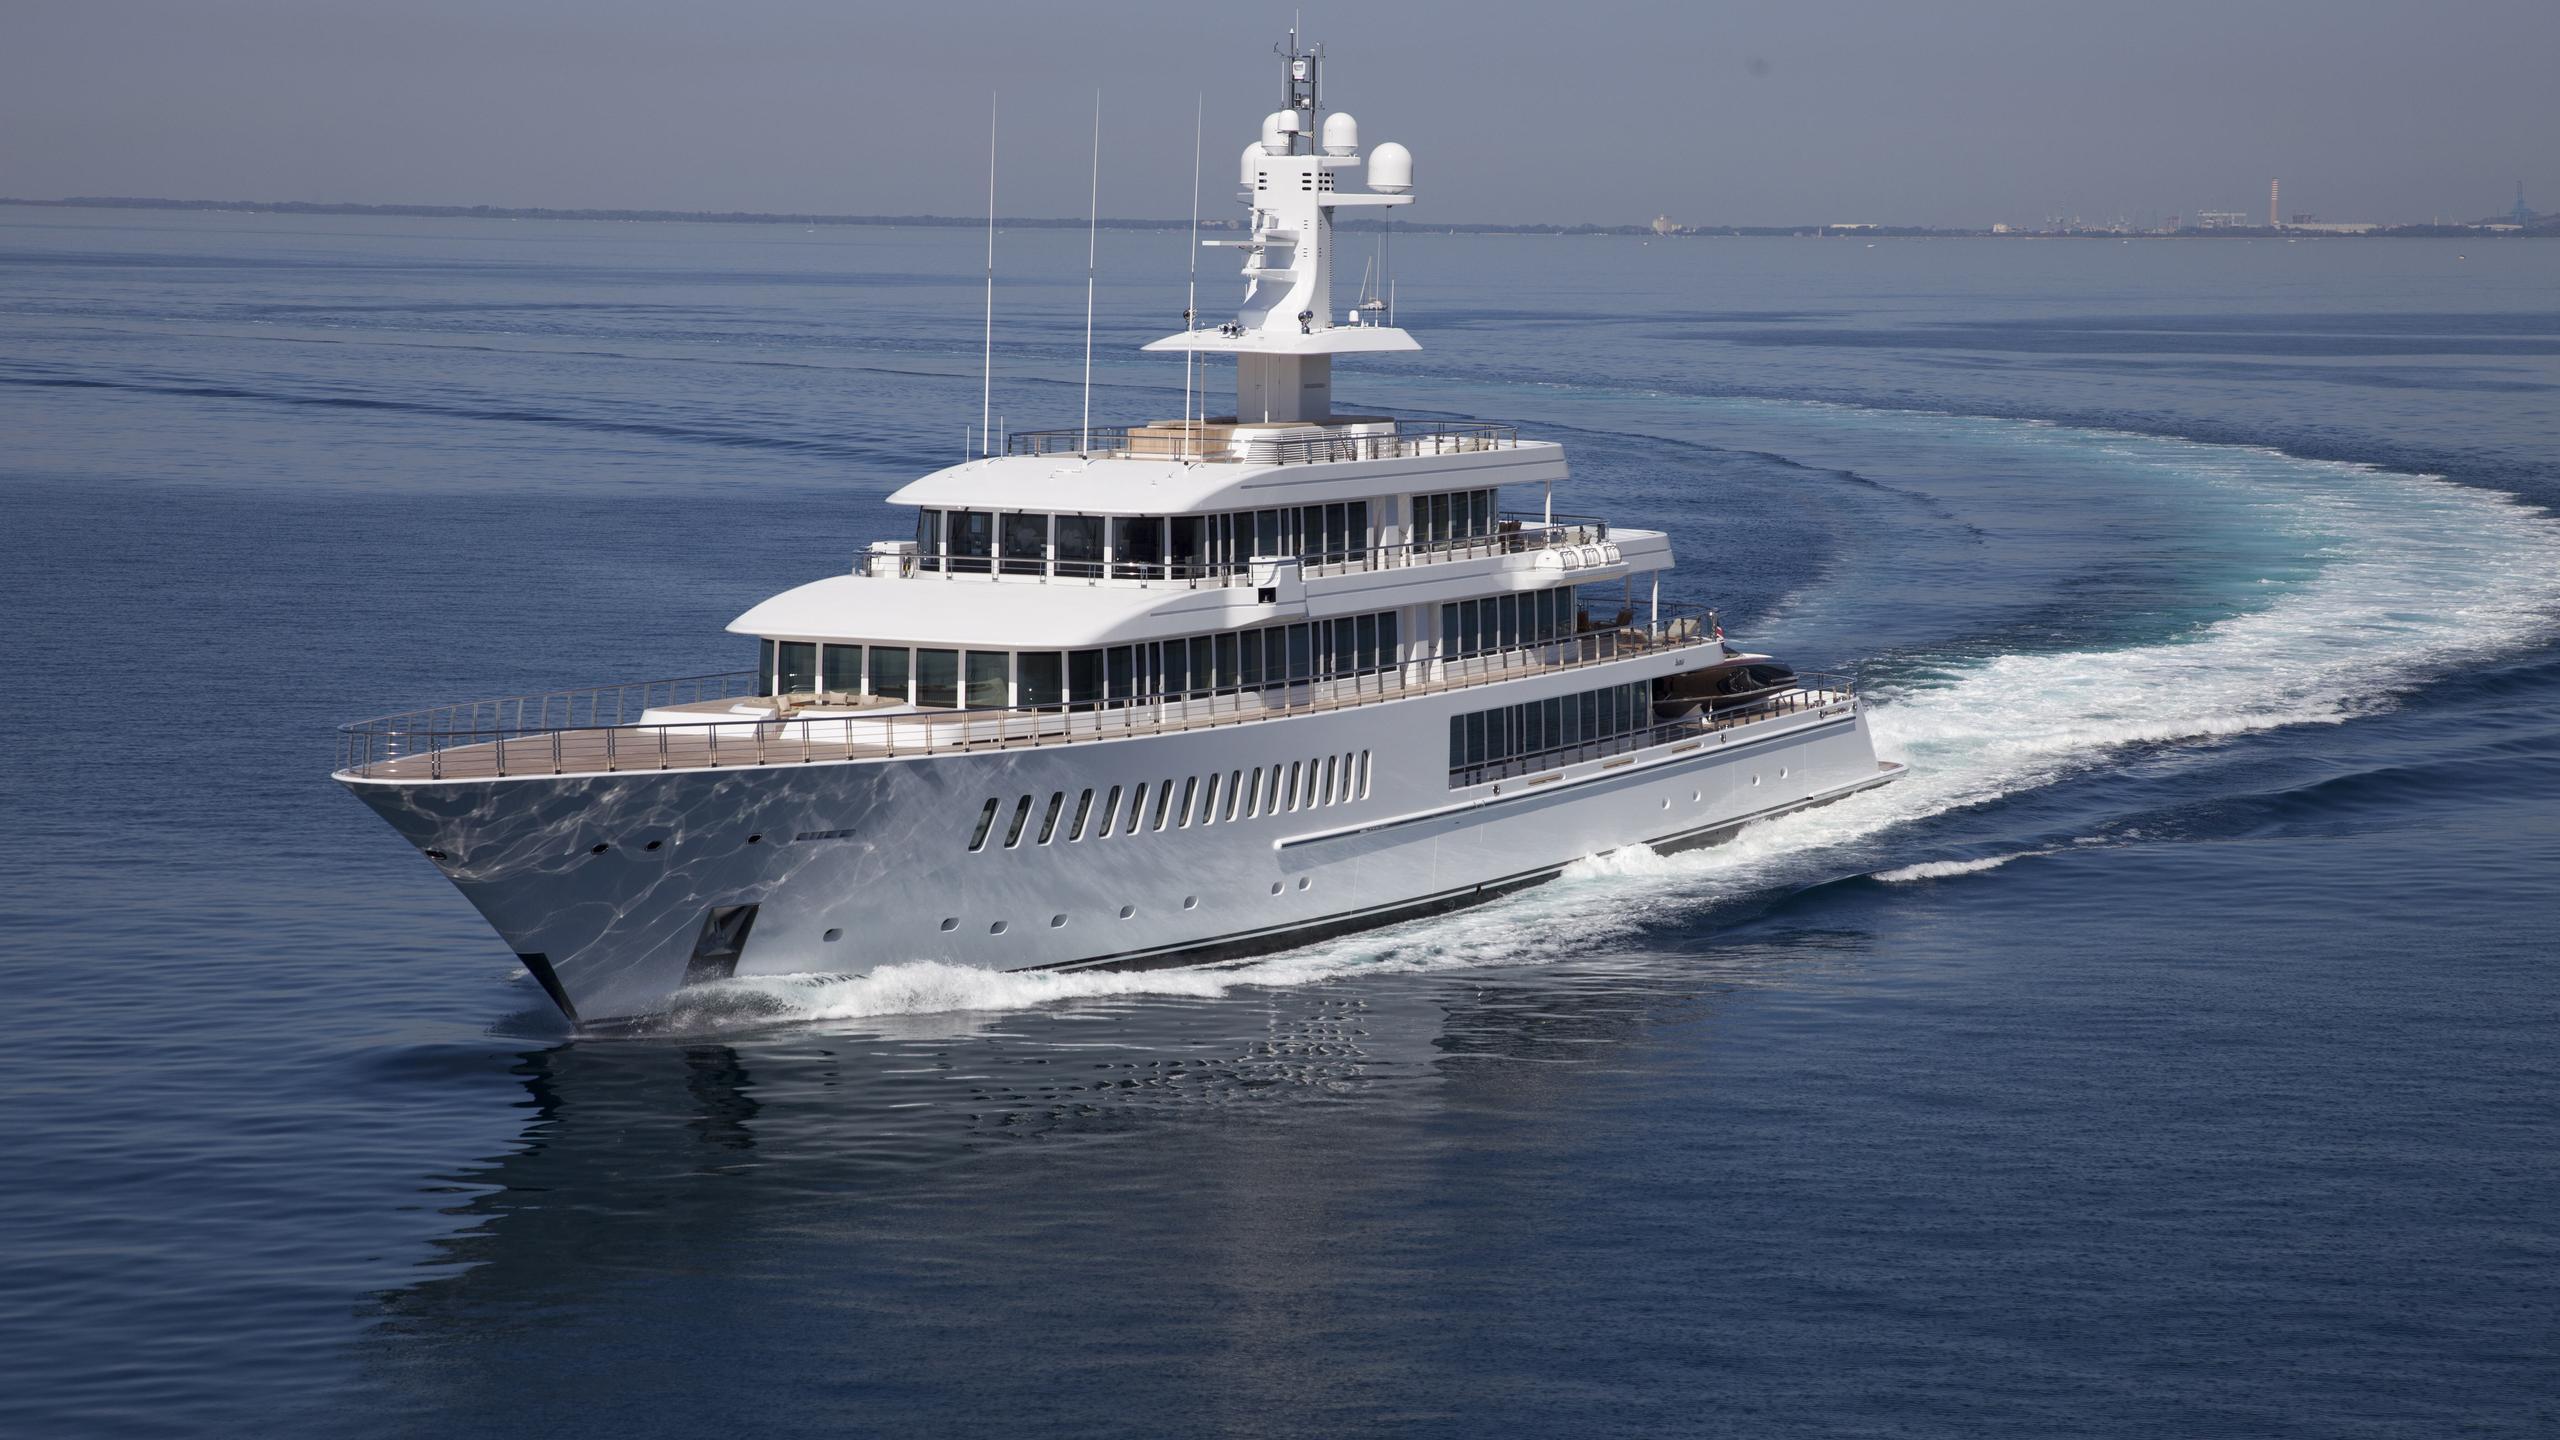 musashi-motor-yacht-feadhsip-2011-88m-bow-cruising